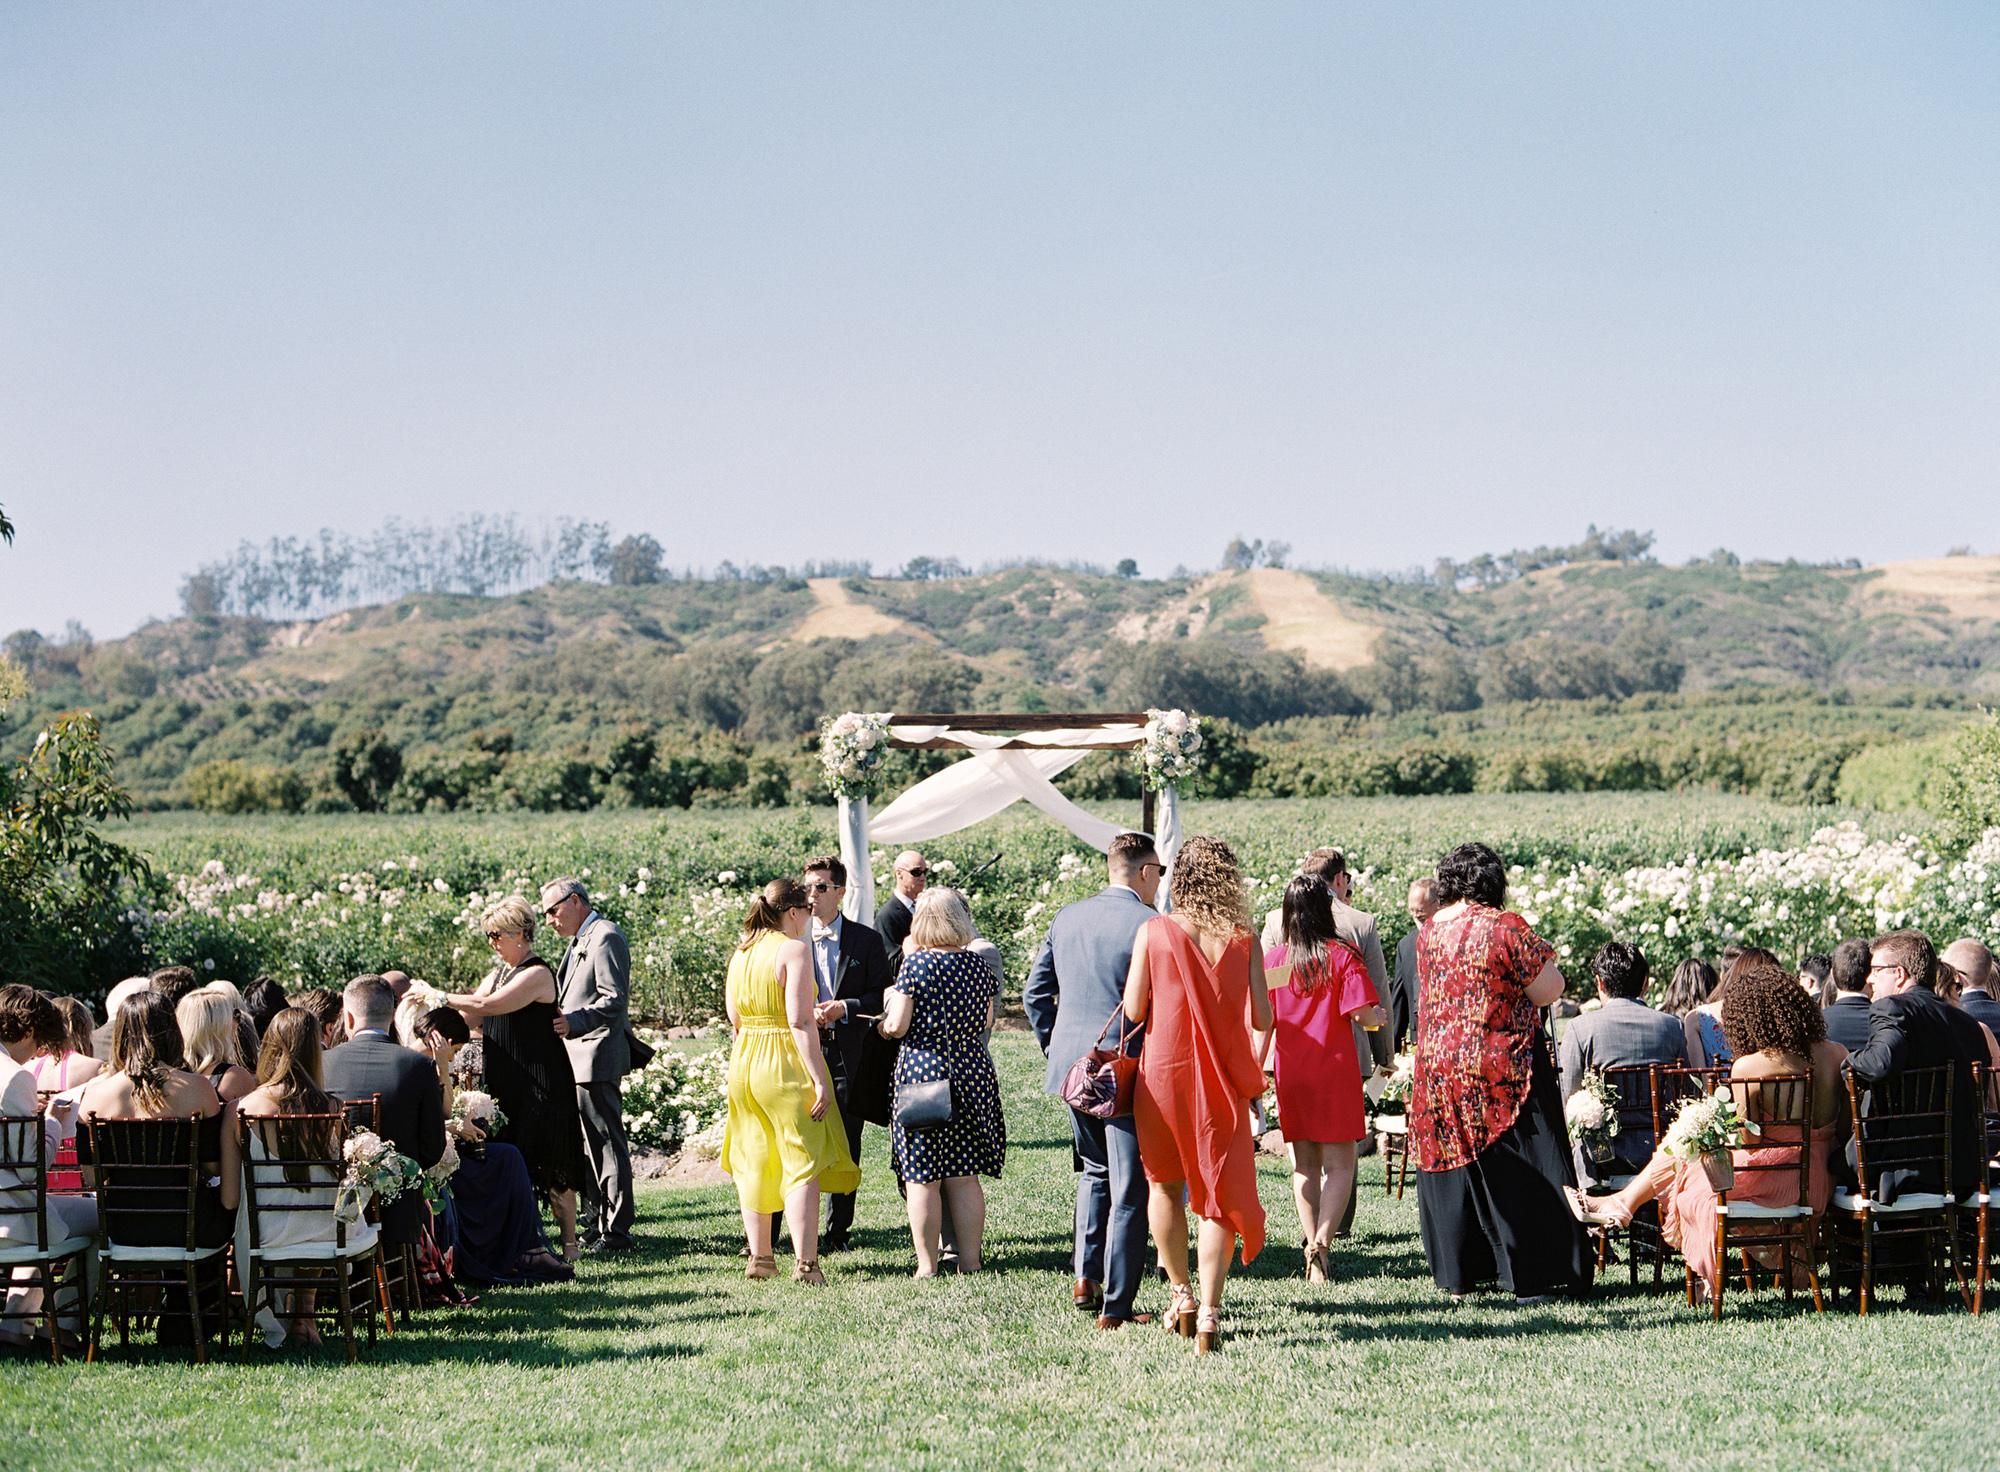 Gerry-Ranch-Wedding-Photography-Kristina-Adams-15.jpg